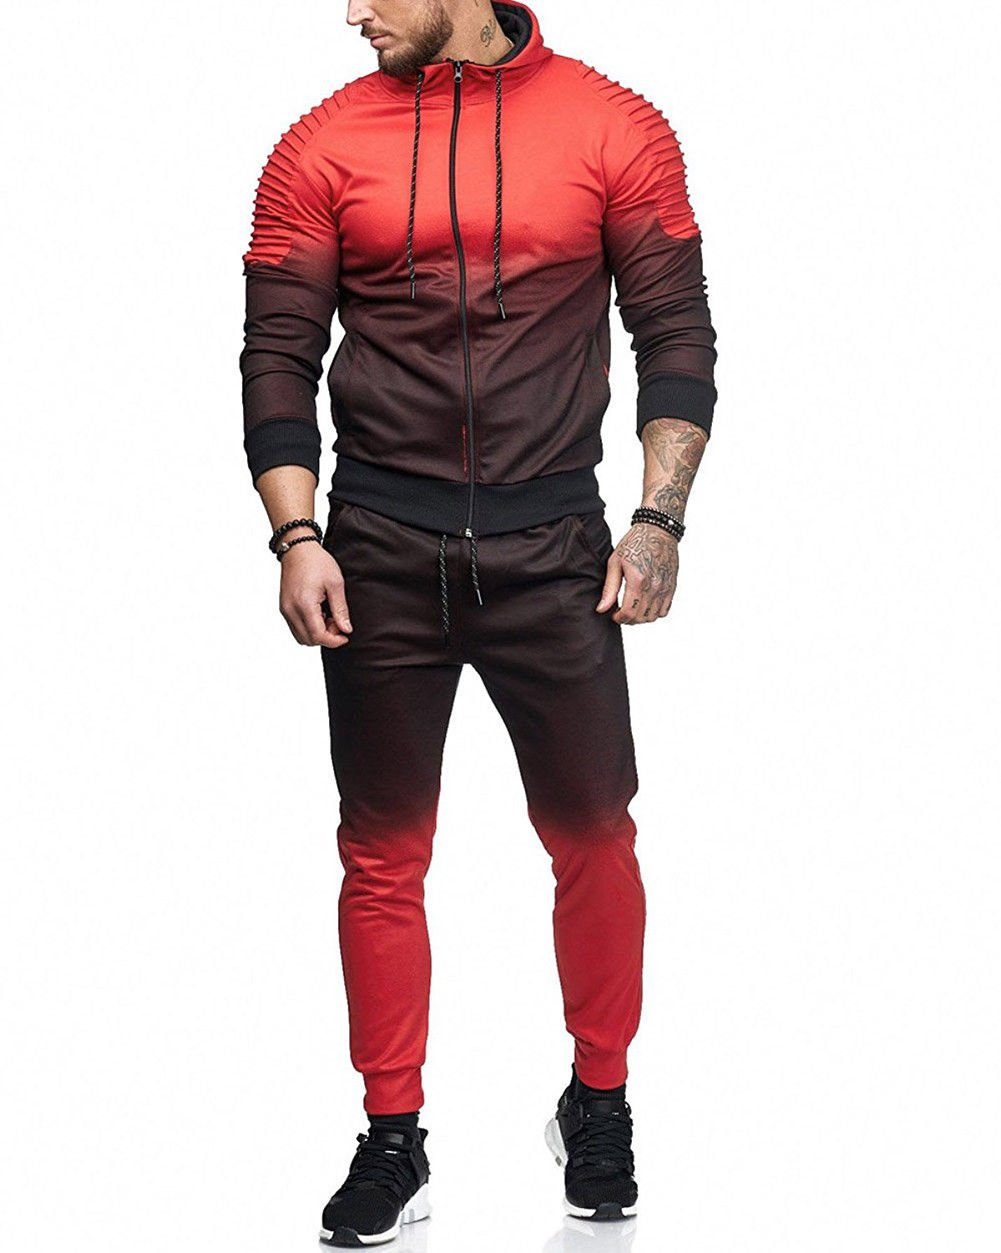 GETHIS Men's 2 Piece Casual Gradient Sport Suit Contrast Jogging Full Sweatsuit Tracksuit Outfit Zipper Hoodies Jacket Coat and Pant (Red, 3XL)